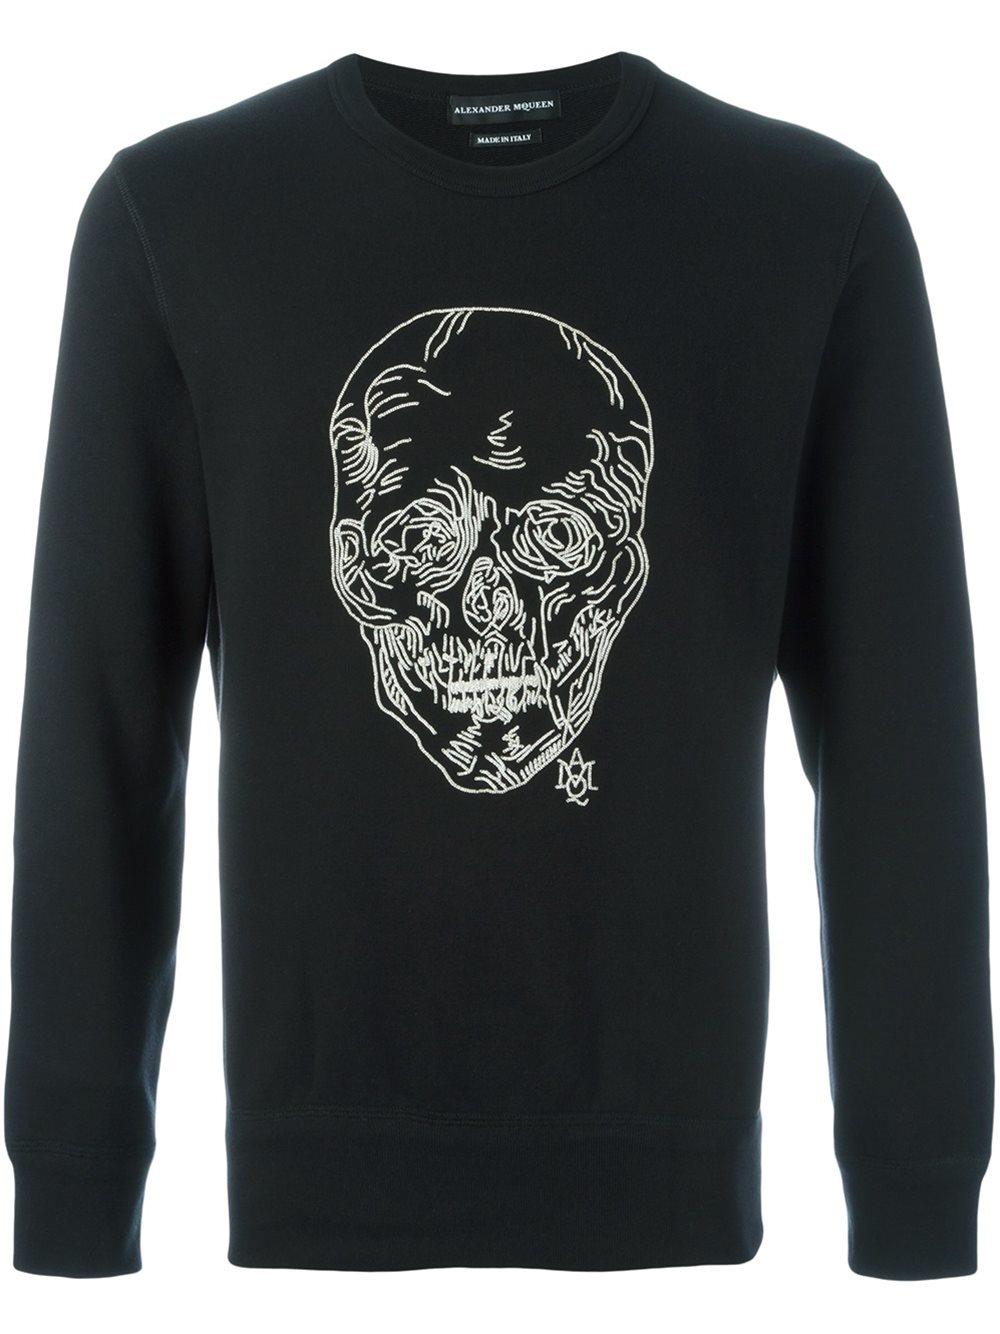 alexander mcqueen chain skull sweatshirt in black for men lyst. Black Bedroom Furniture Sets. Home Design Ideas